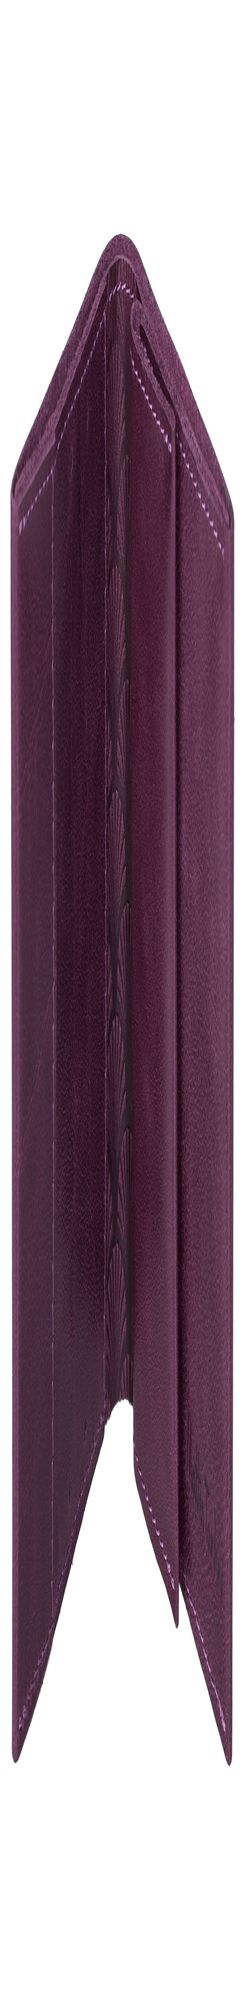 Портмоне Letizia, фиолетовое фото